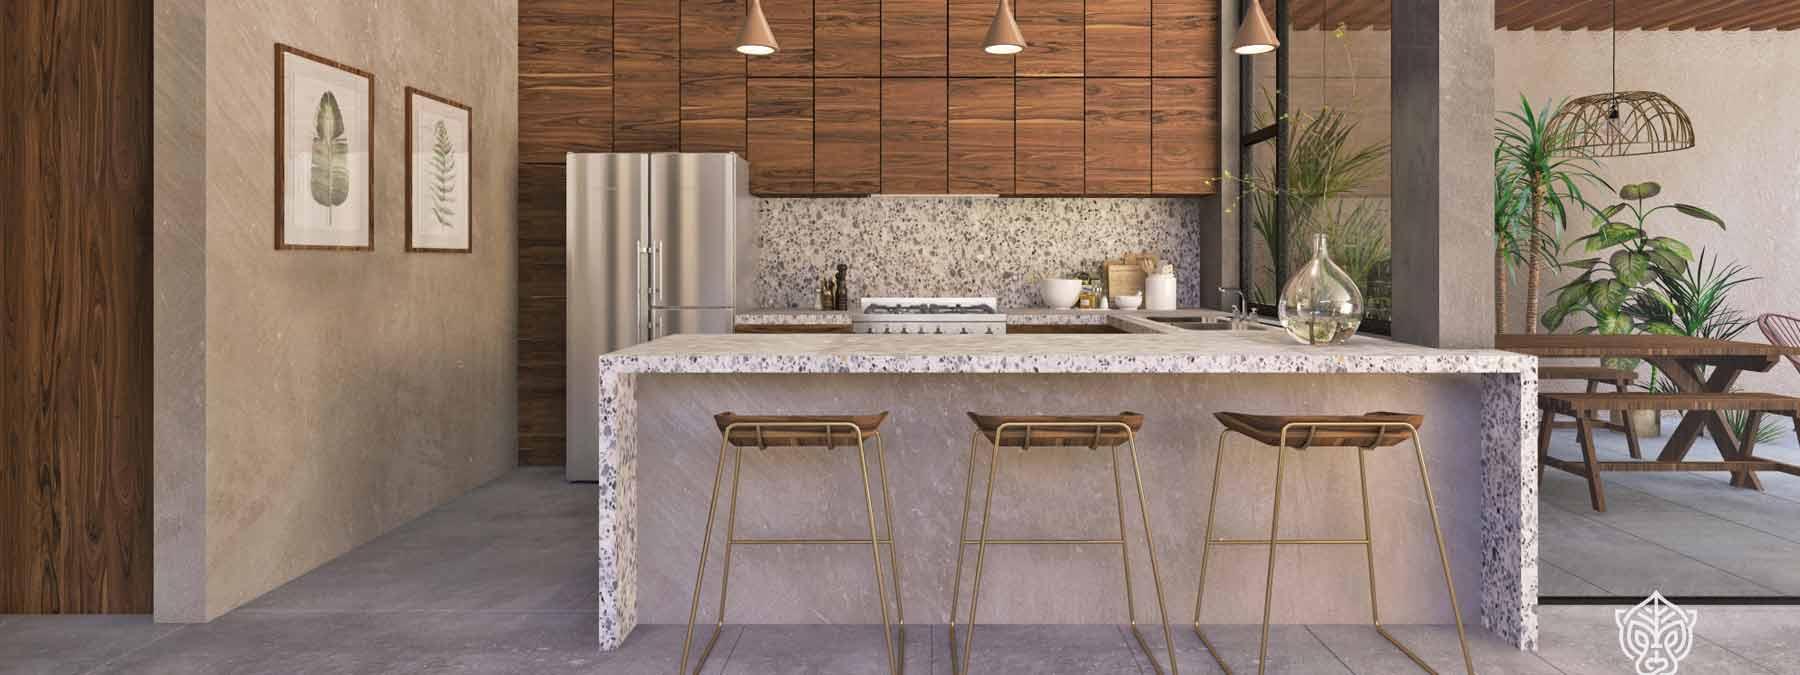 Florafauna-Tulum-CENTER-HOME_Kitchen